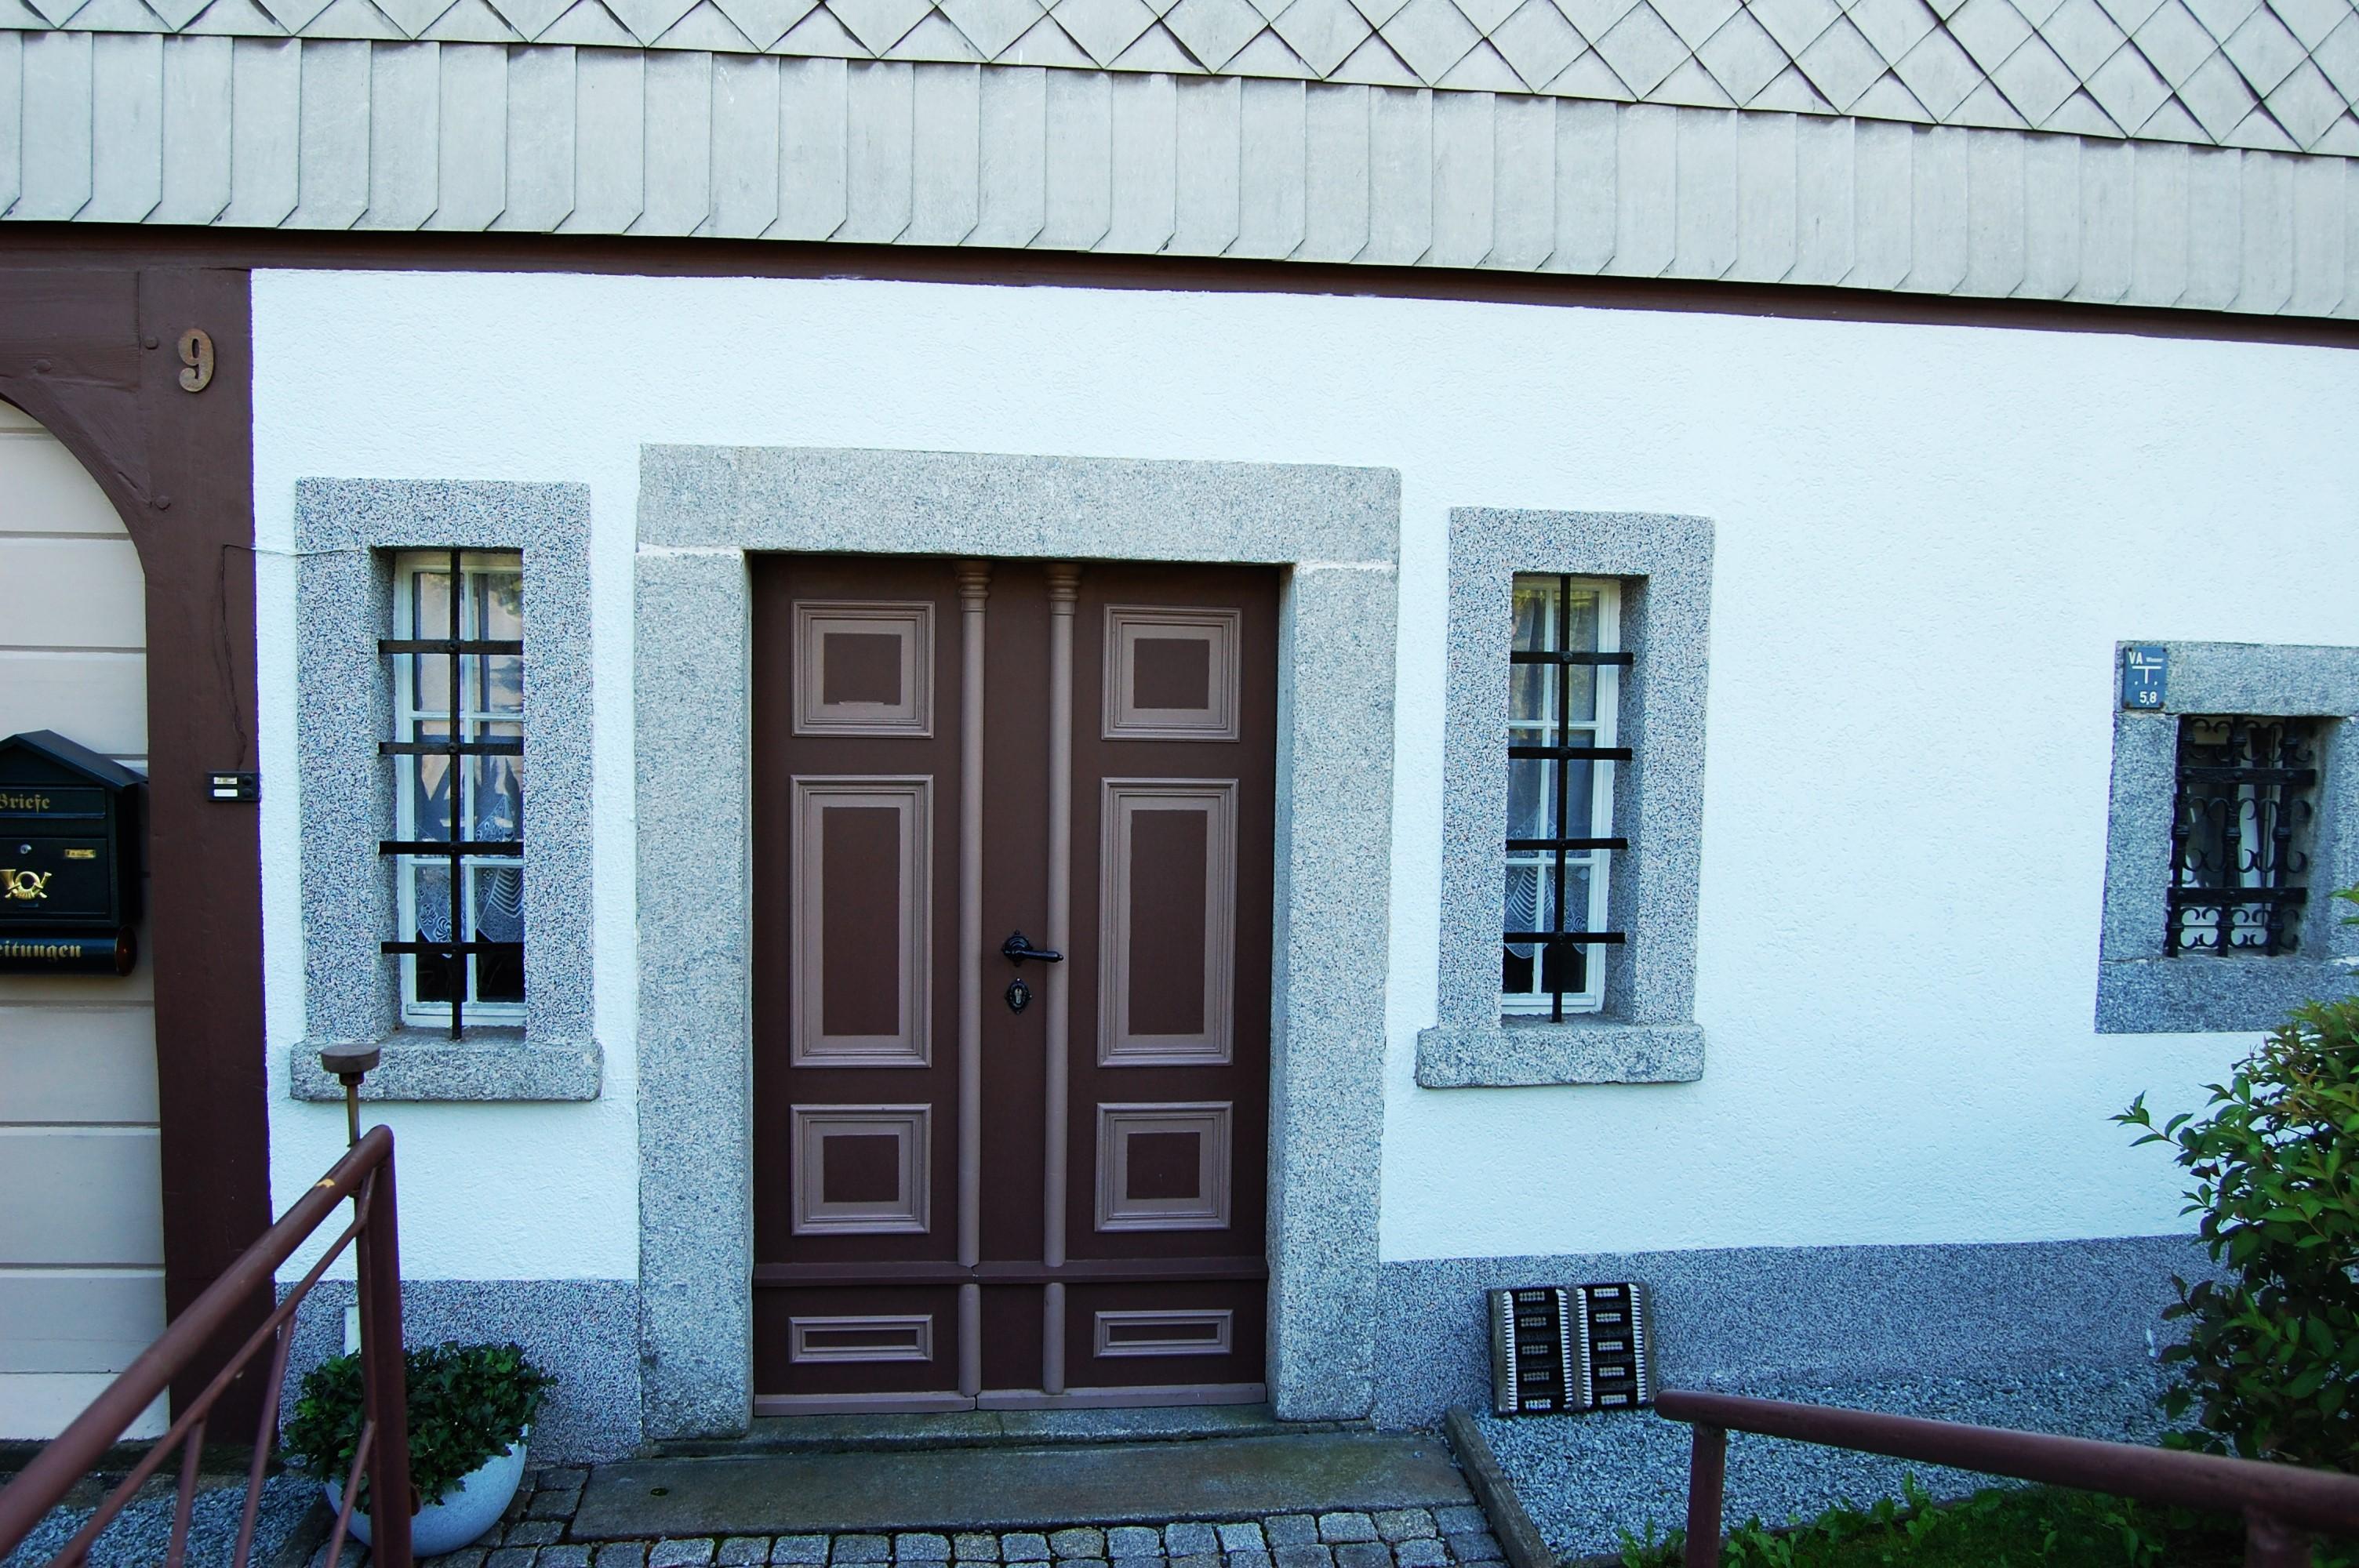 file umgebinde k the kollwitz stra e 9 walddorf 2 jpg wikimedia commons. Black Bedroom Furniture Sets. Home Design Ideas